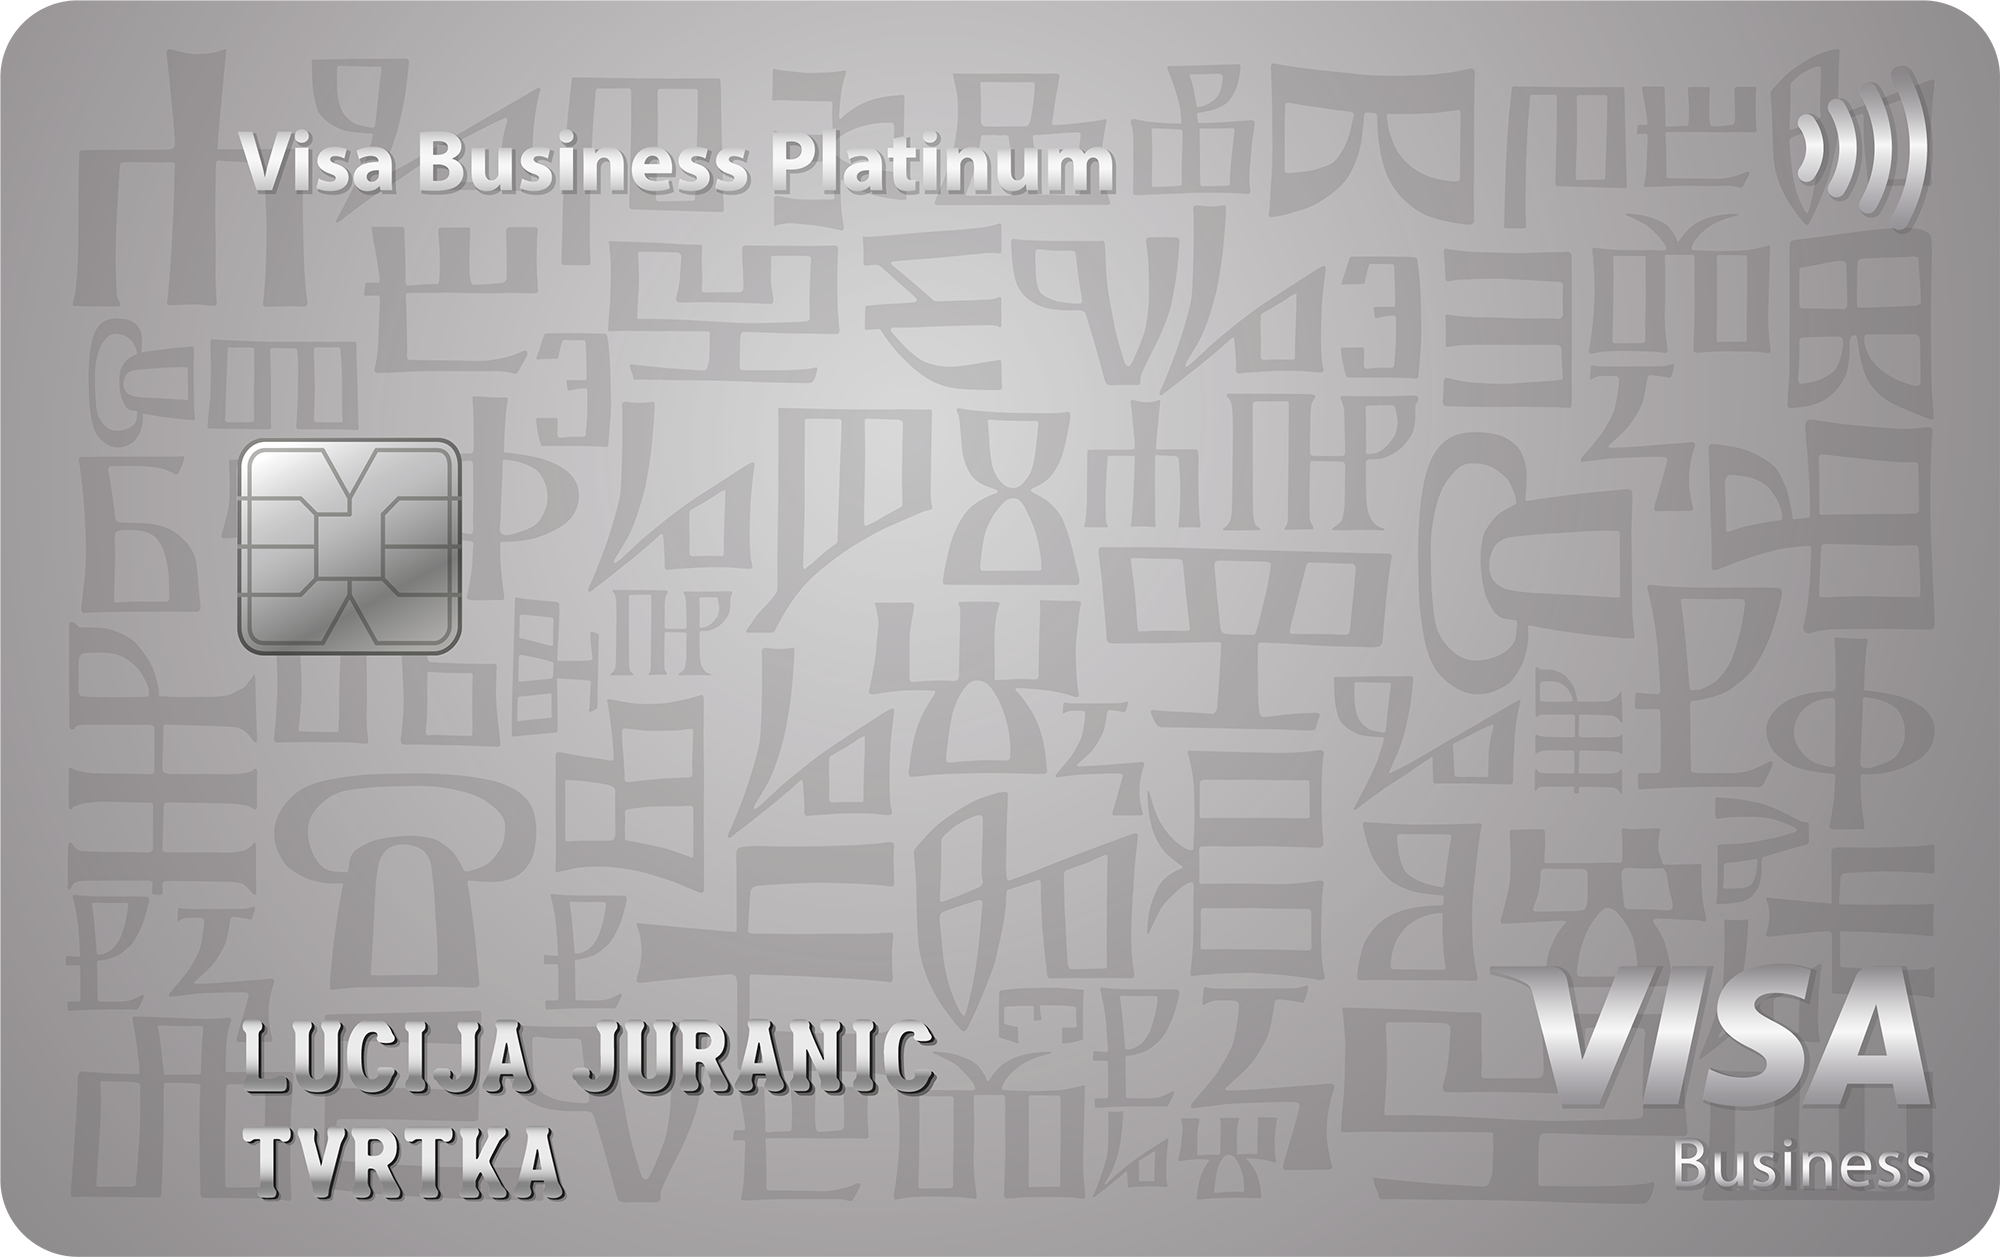 Visa Business Platinum